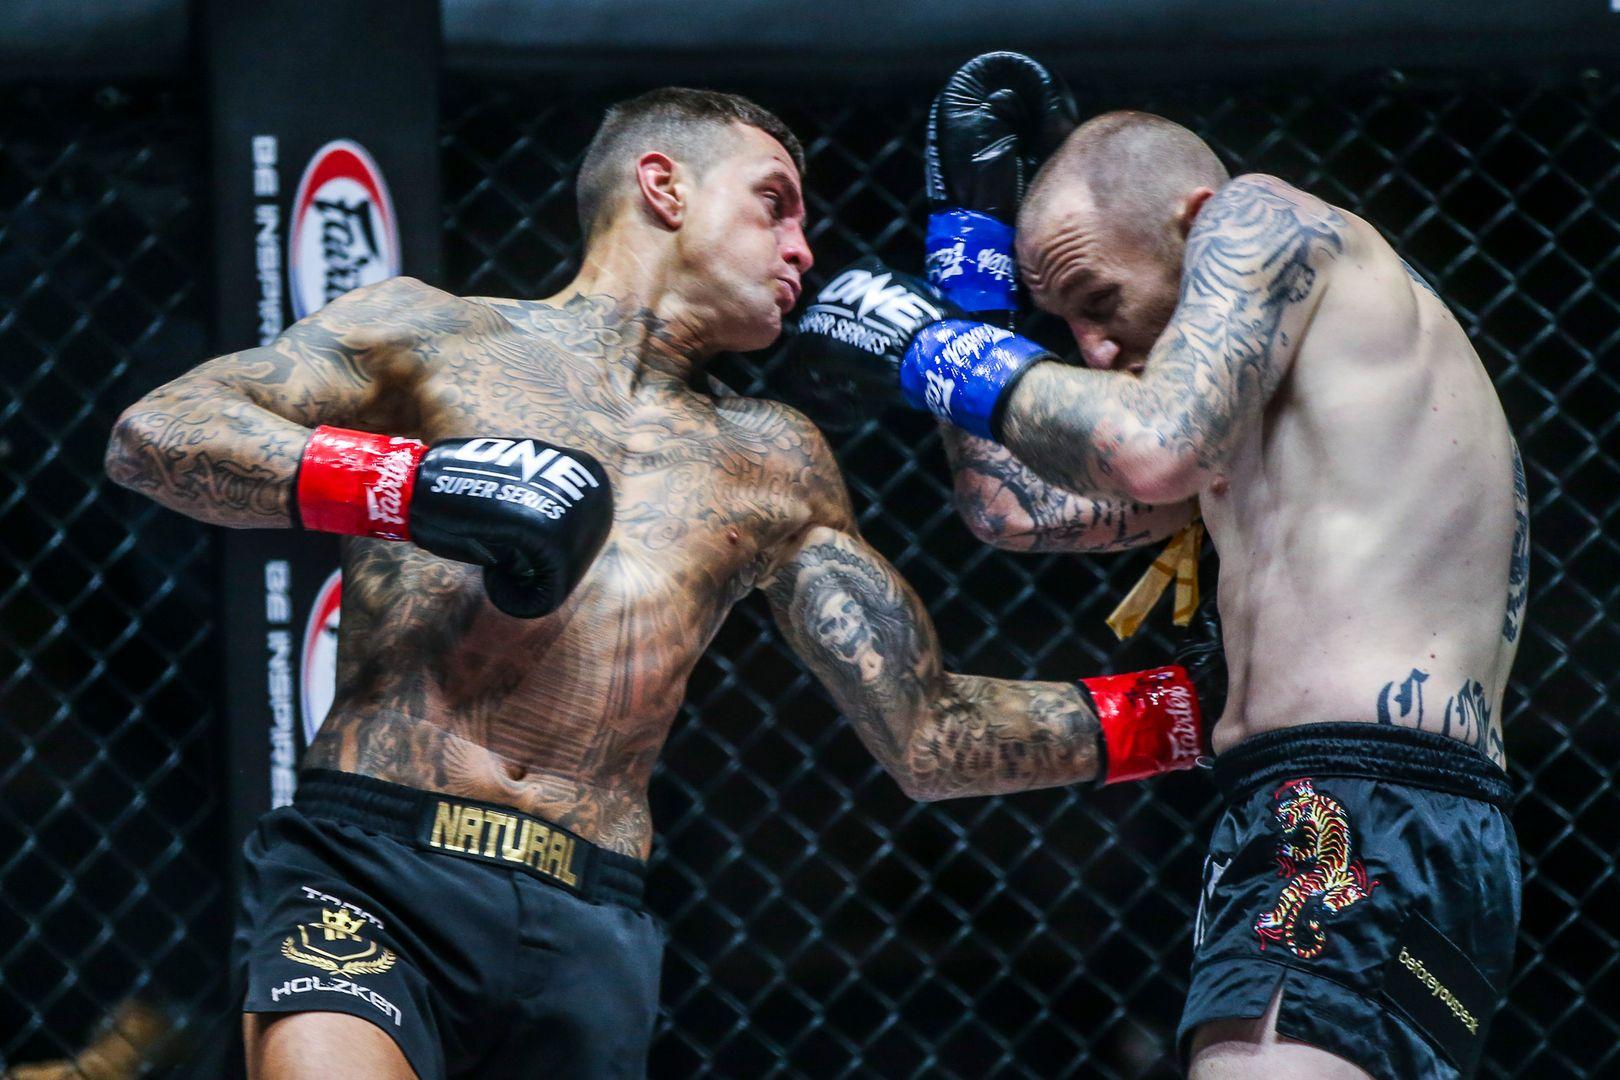 Dutch kickboxing legend Nieky Holzken fights Australian star Elliot Compton at ONE: BIG BANG II in December 2020